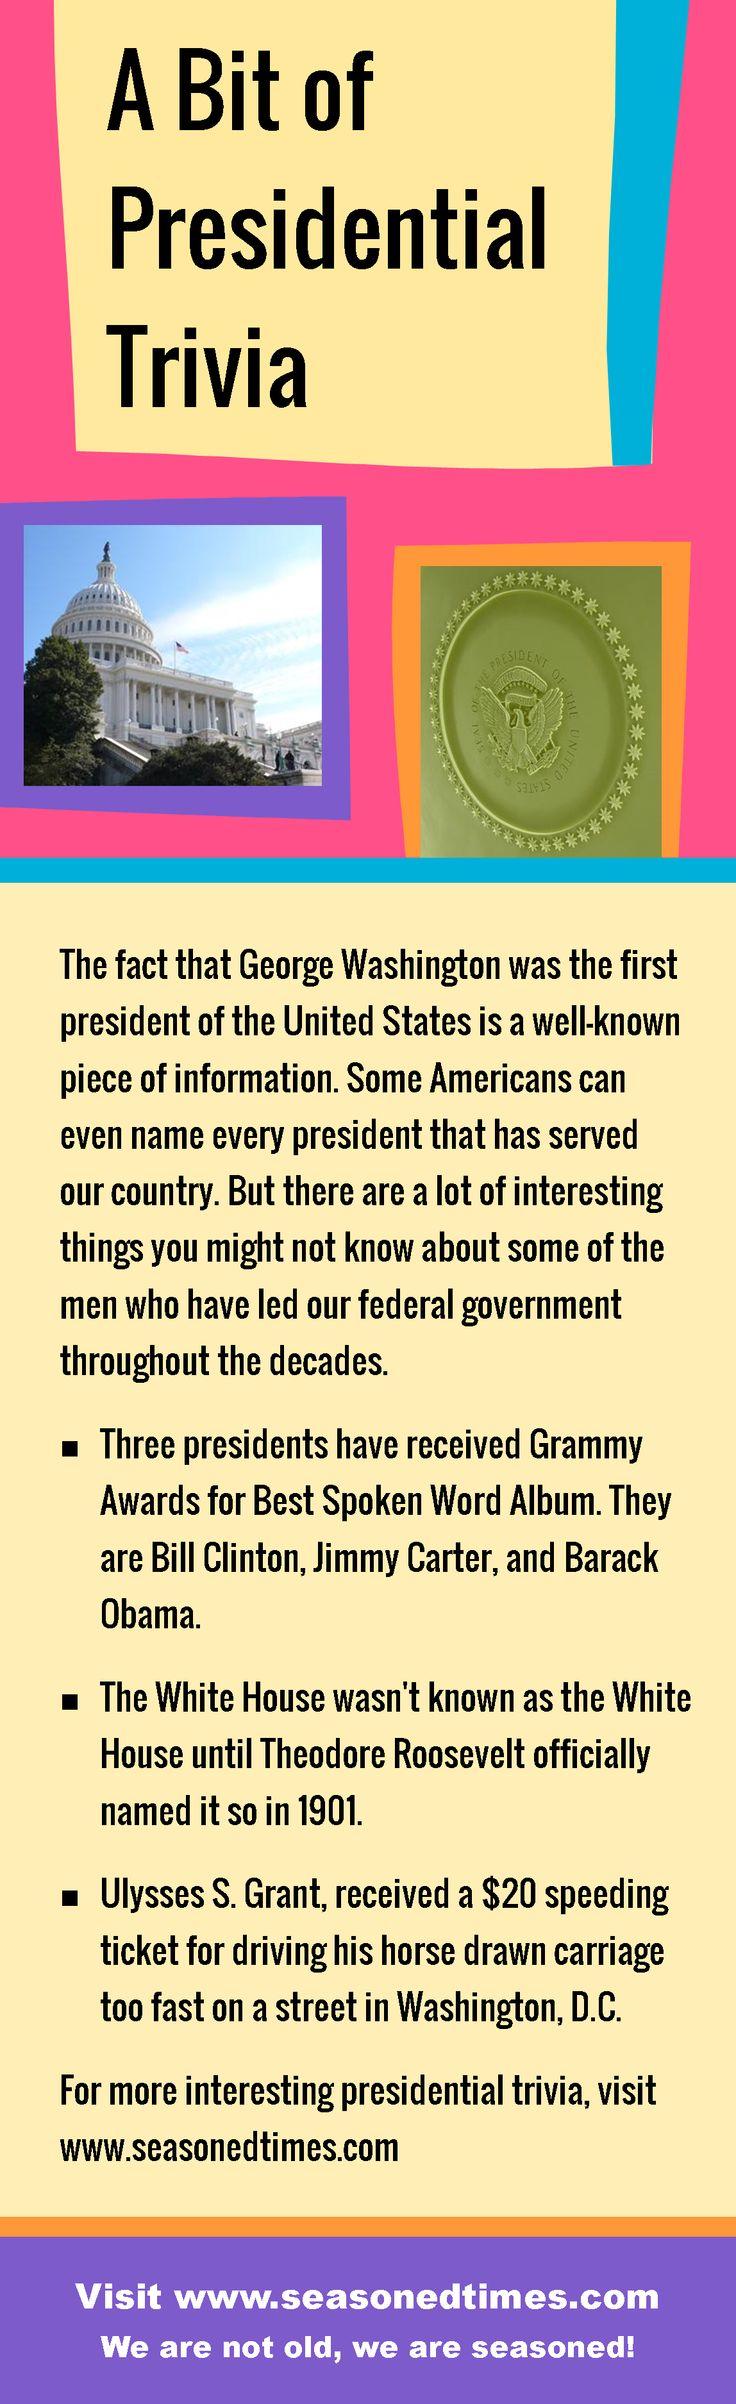 A bit of presidential trivia seasoned times celebrates the seasoned times of life